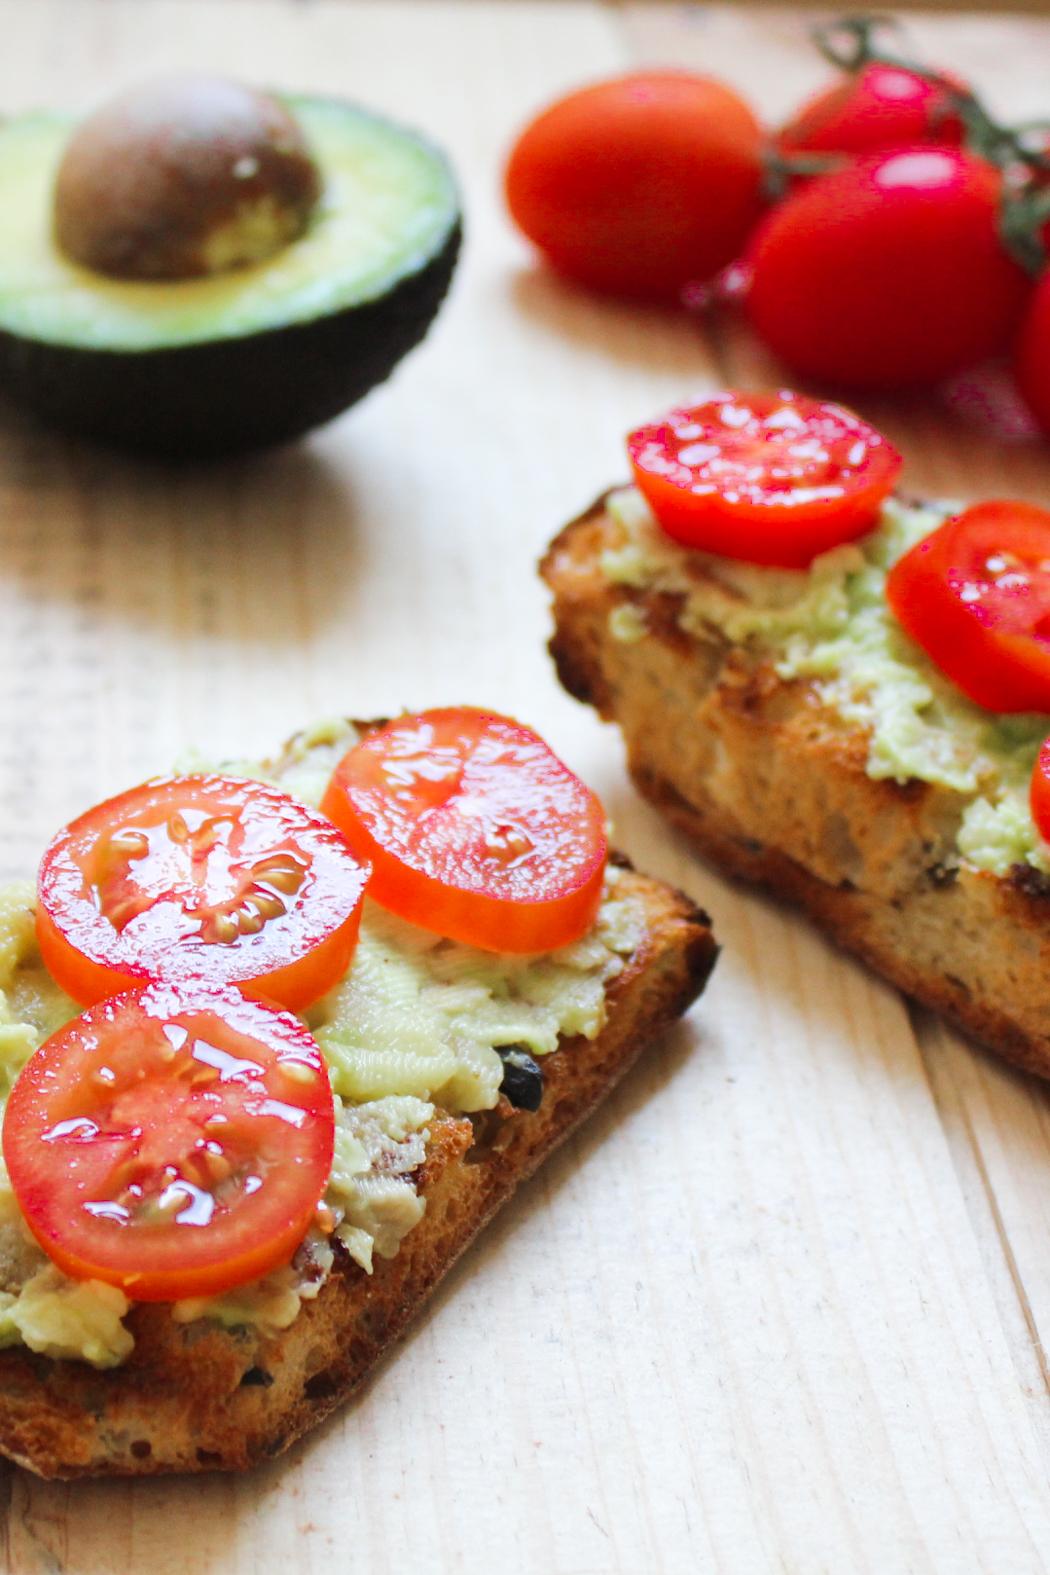 Avocadobrot-Foodblogger-Lindarella-München-Tomatenbrot-Vegan-Rezept-3